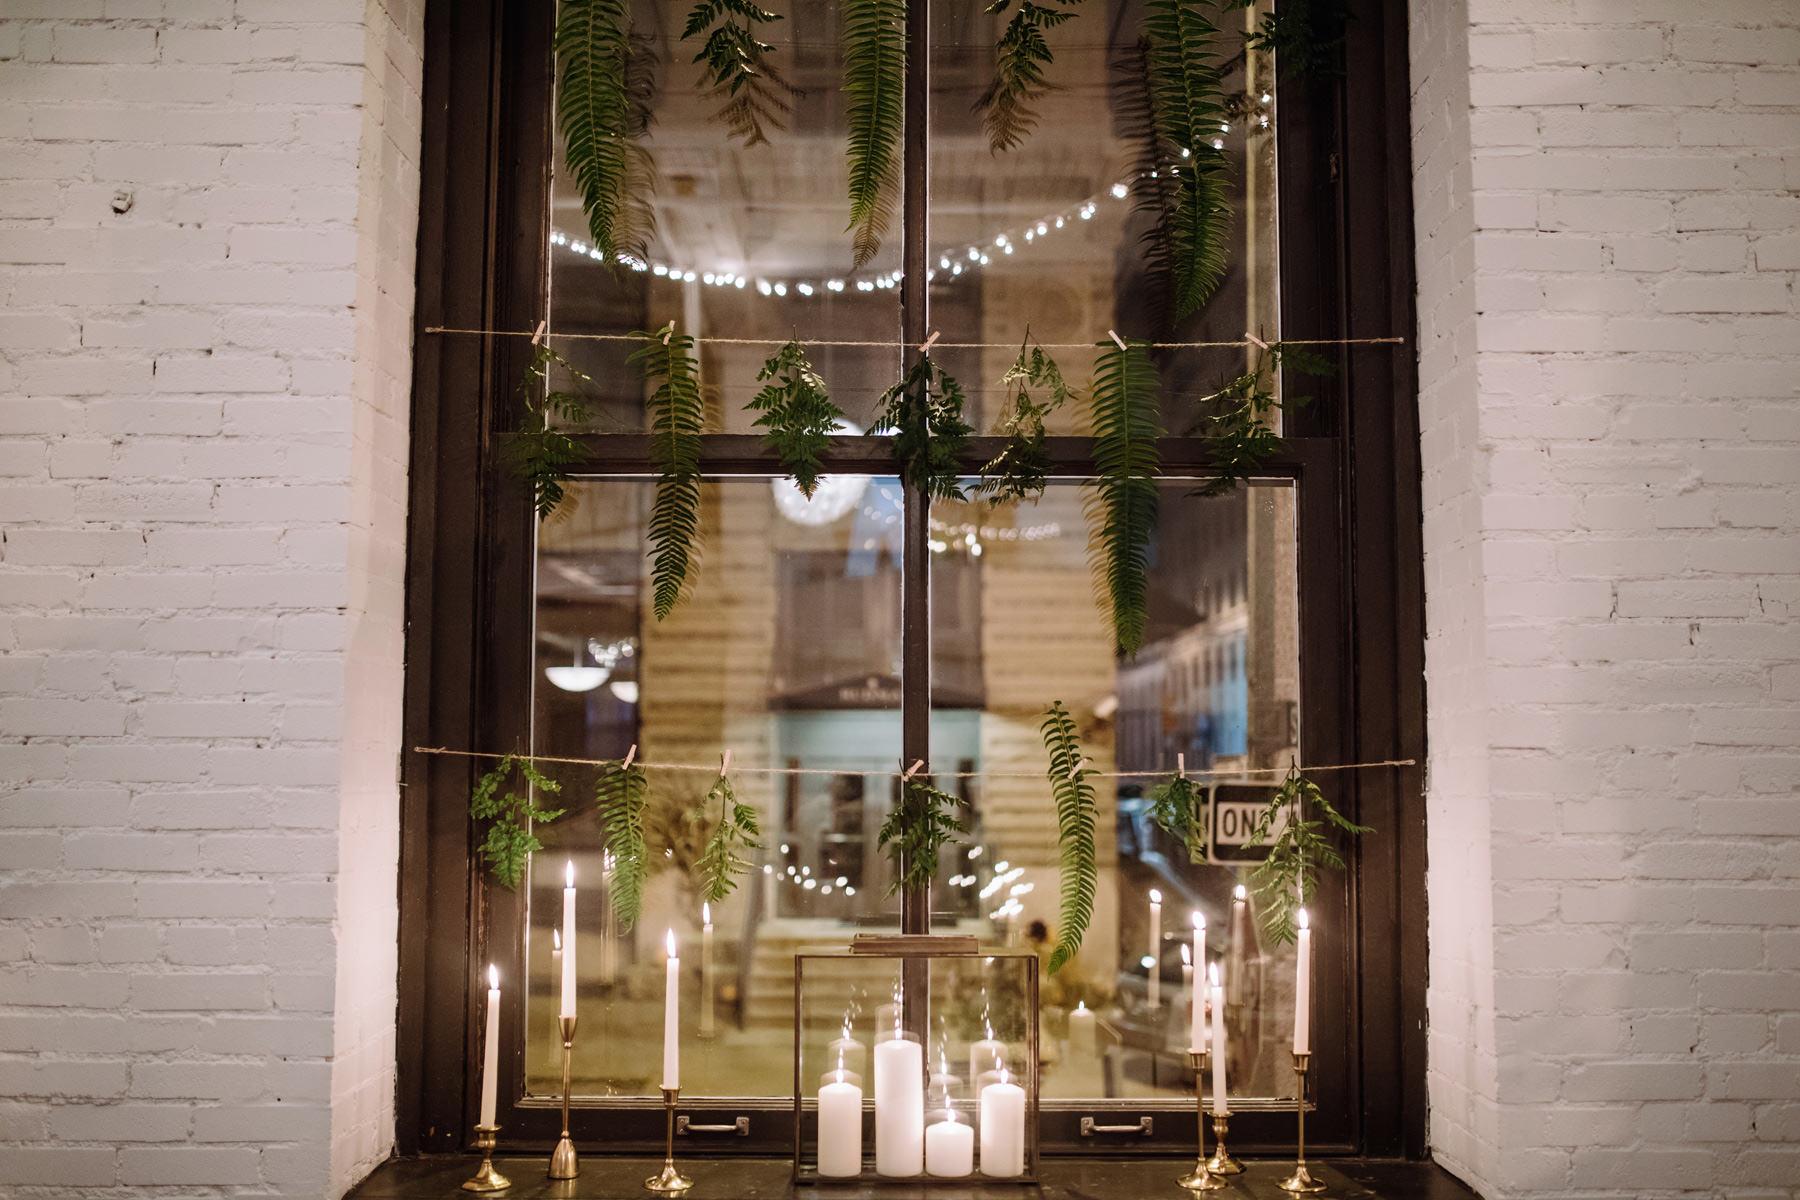 Memorial Presbyterian Wedding in St. Louis Missouri_Kindling Wedding Photography046.JPG